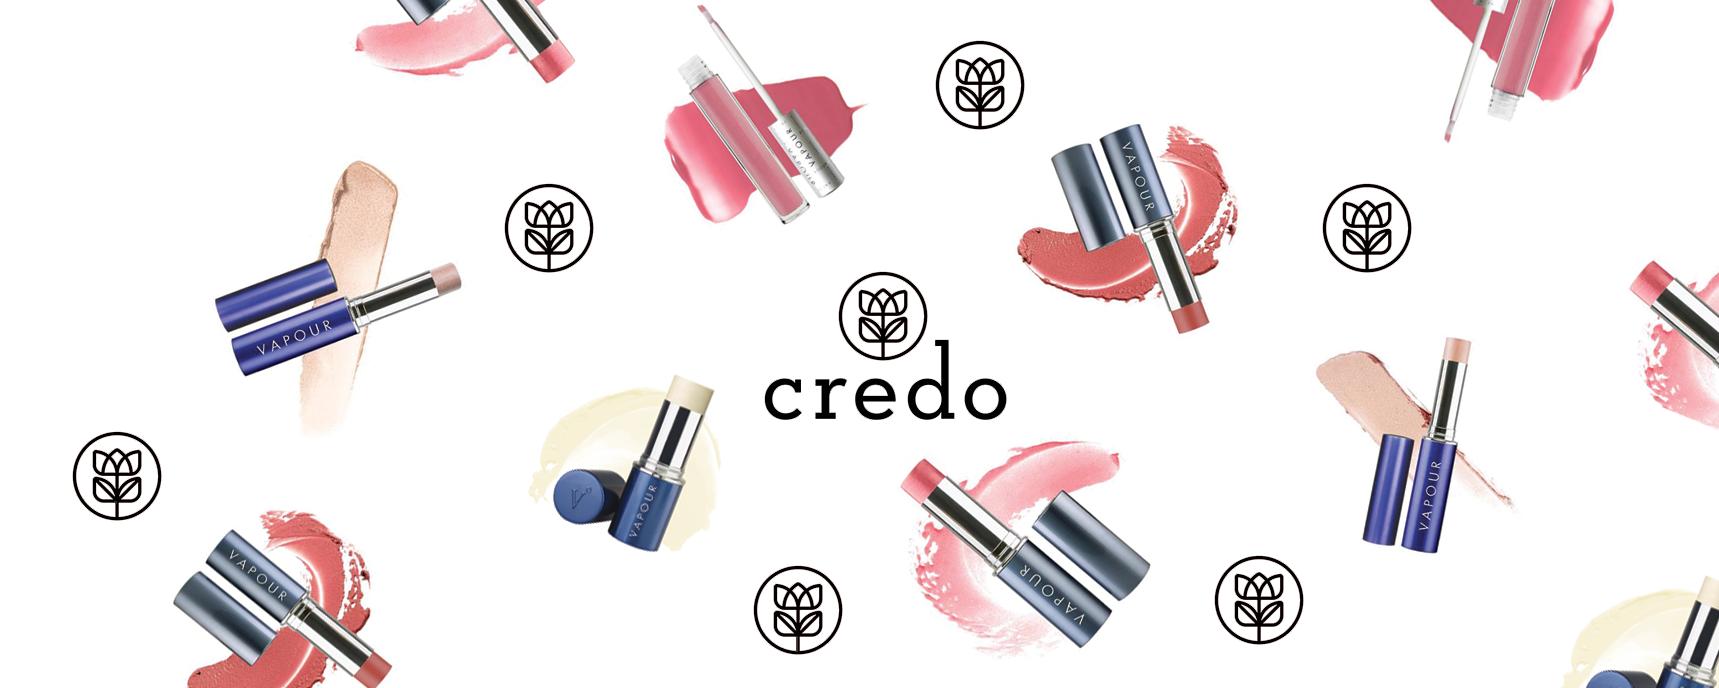 Credo Beauty Slider 2